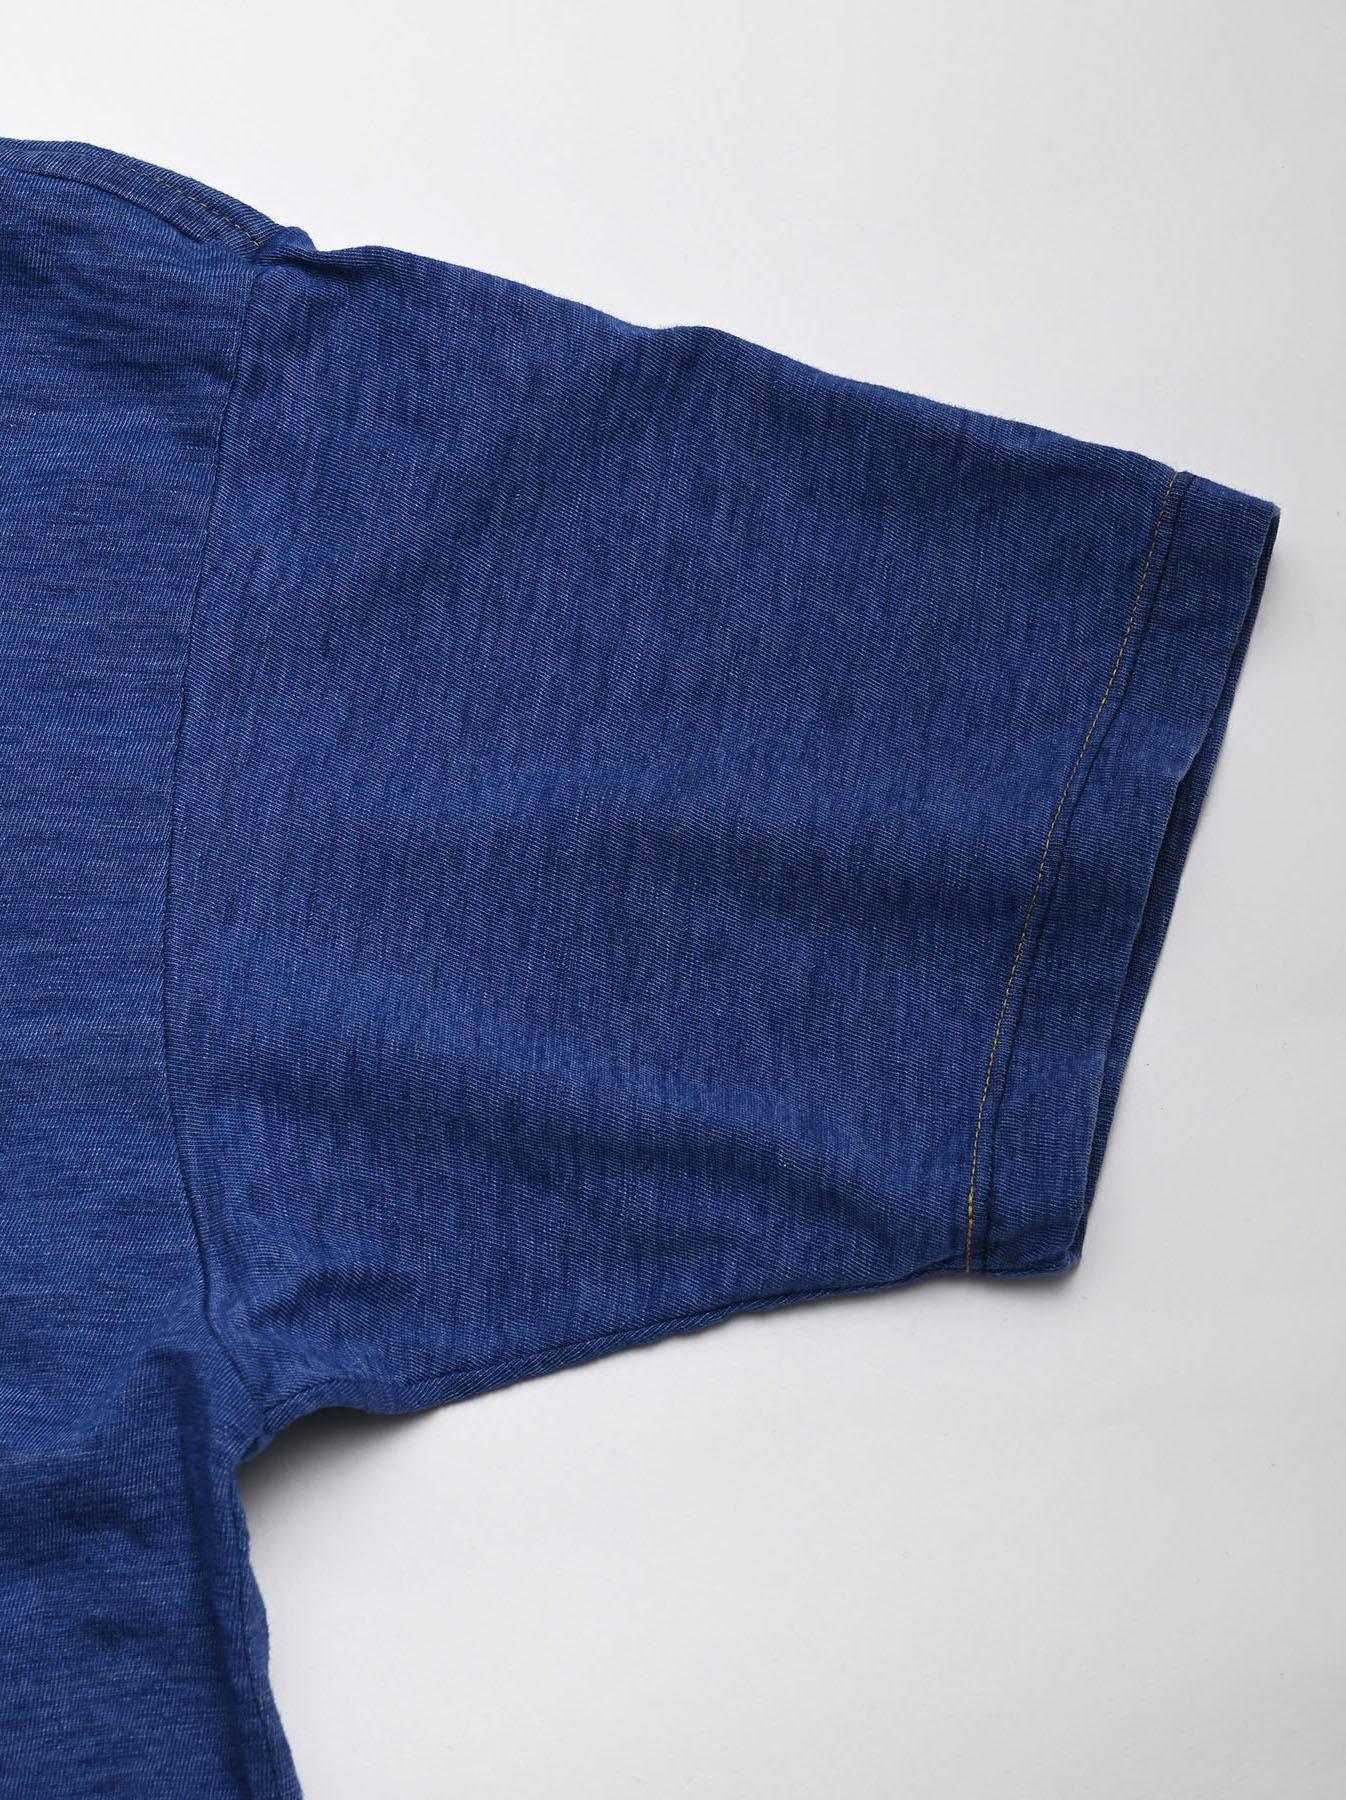 Distressed Indigo Tenjiku 908 Ocean T-Shirt (0621)-8